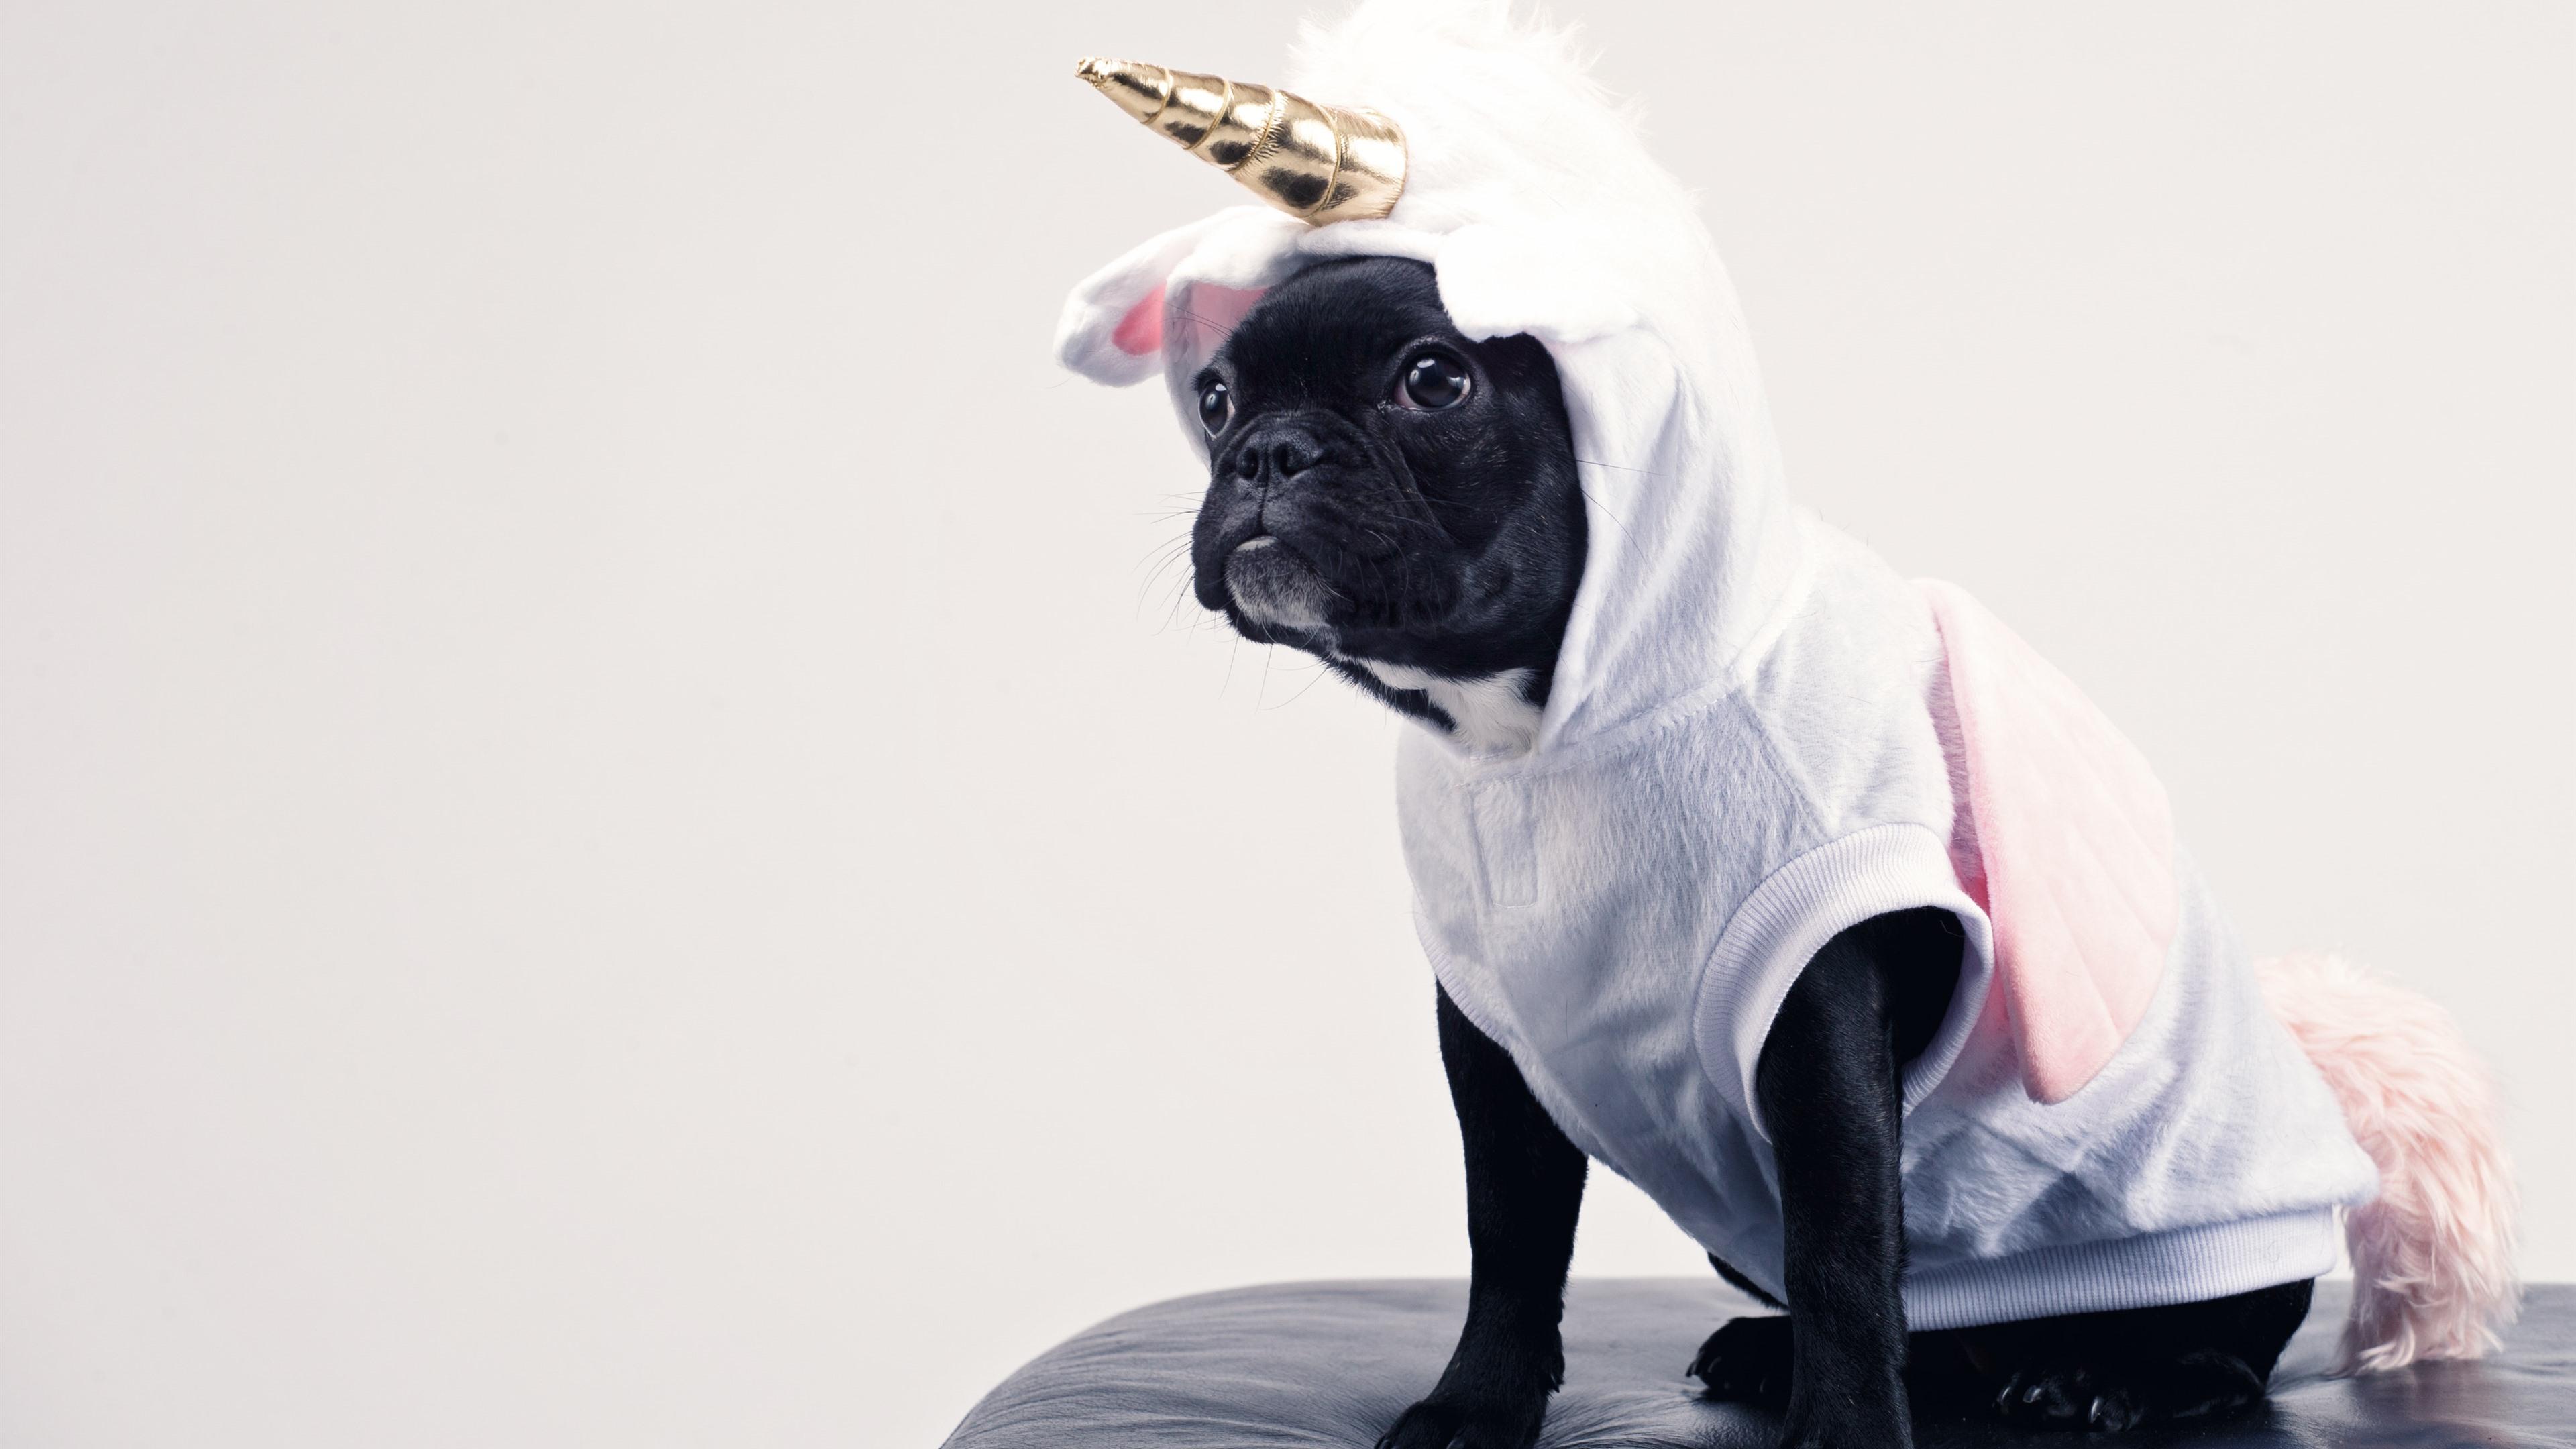 Wallpaper Funny dog, unicorn 3840x2160 ...